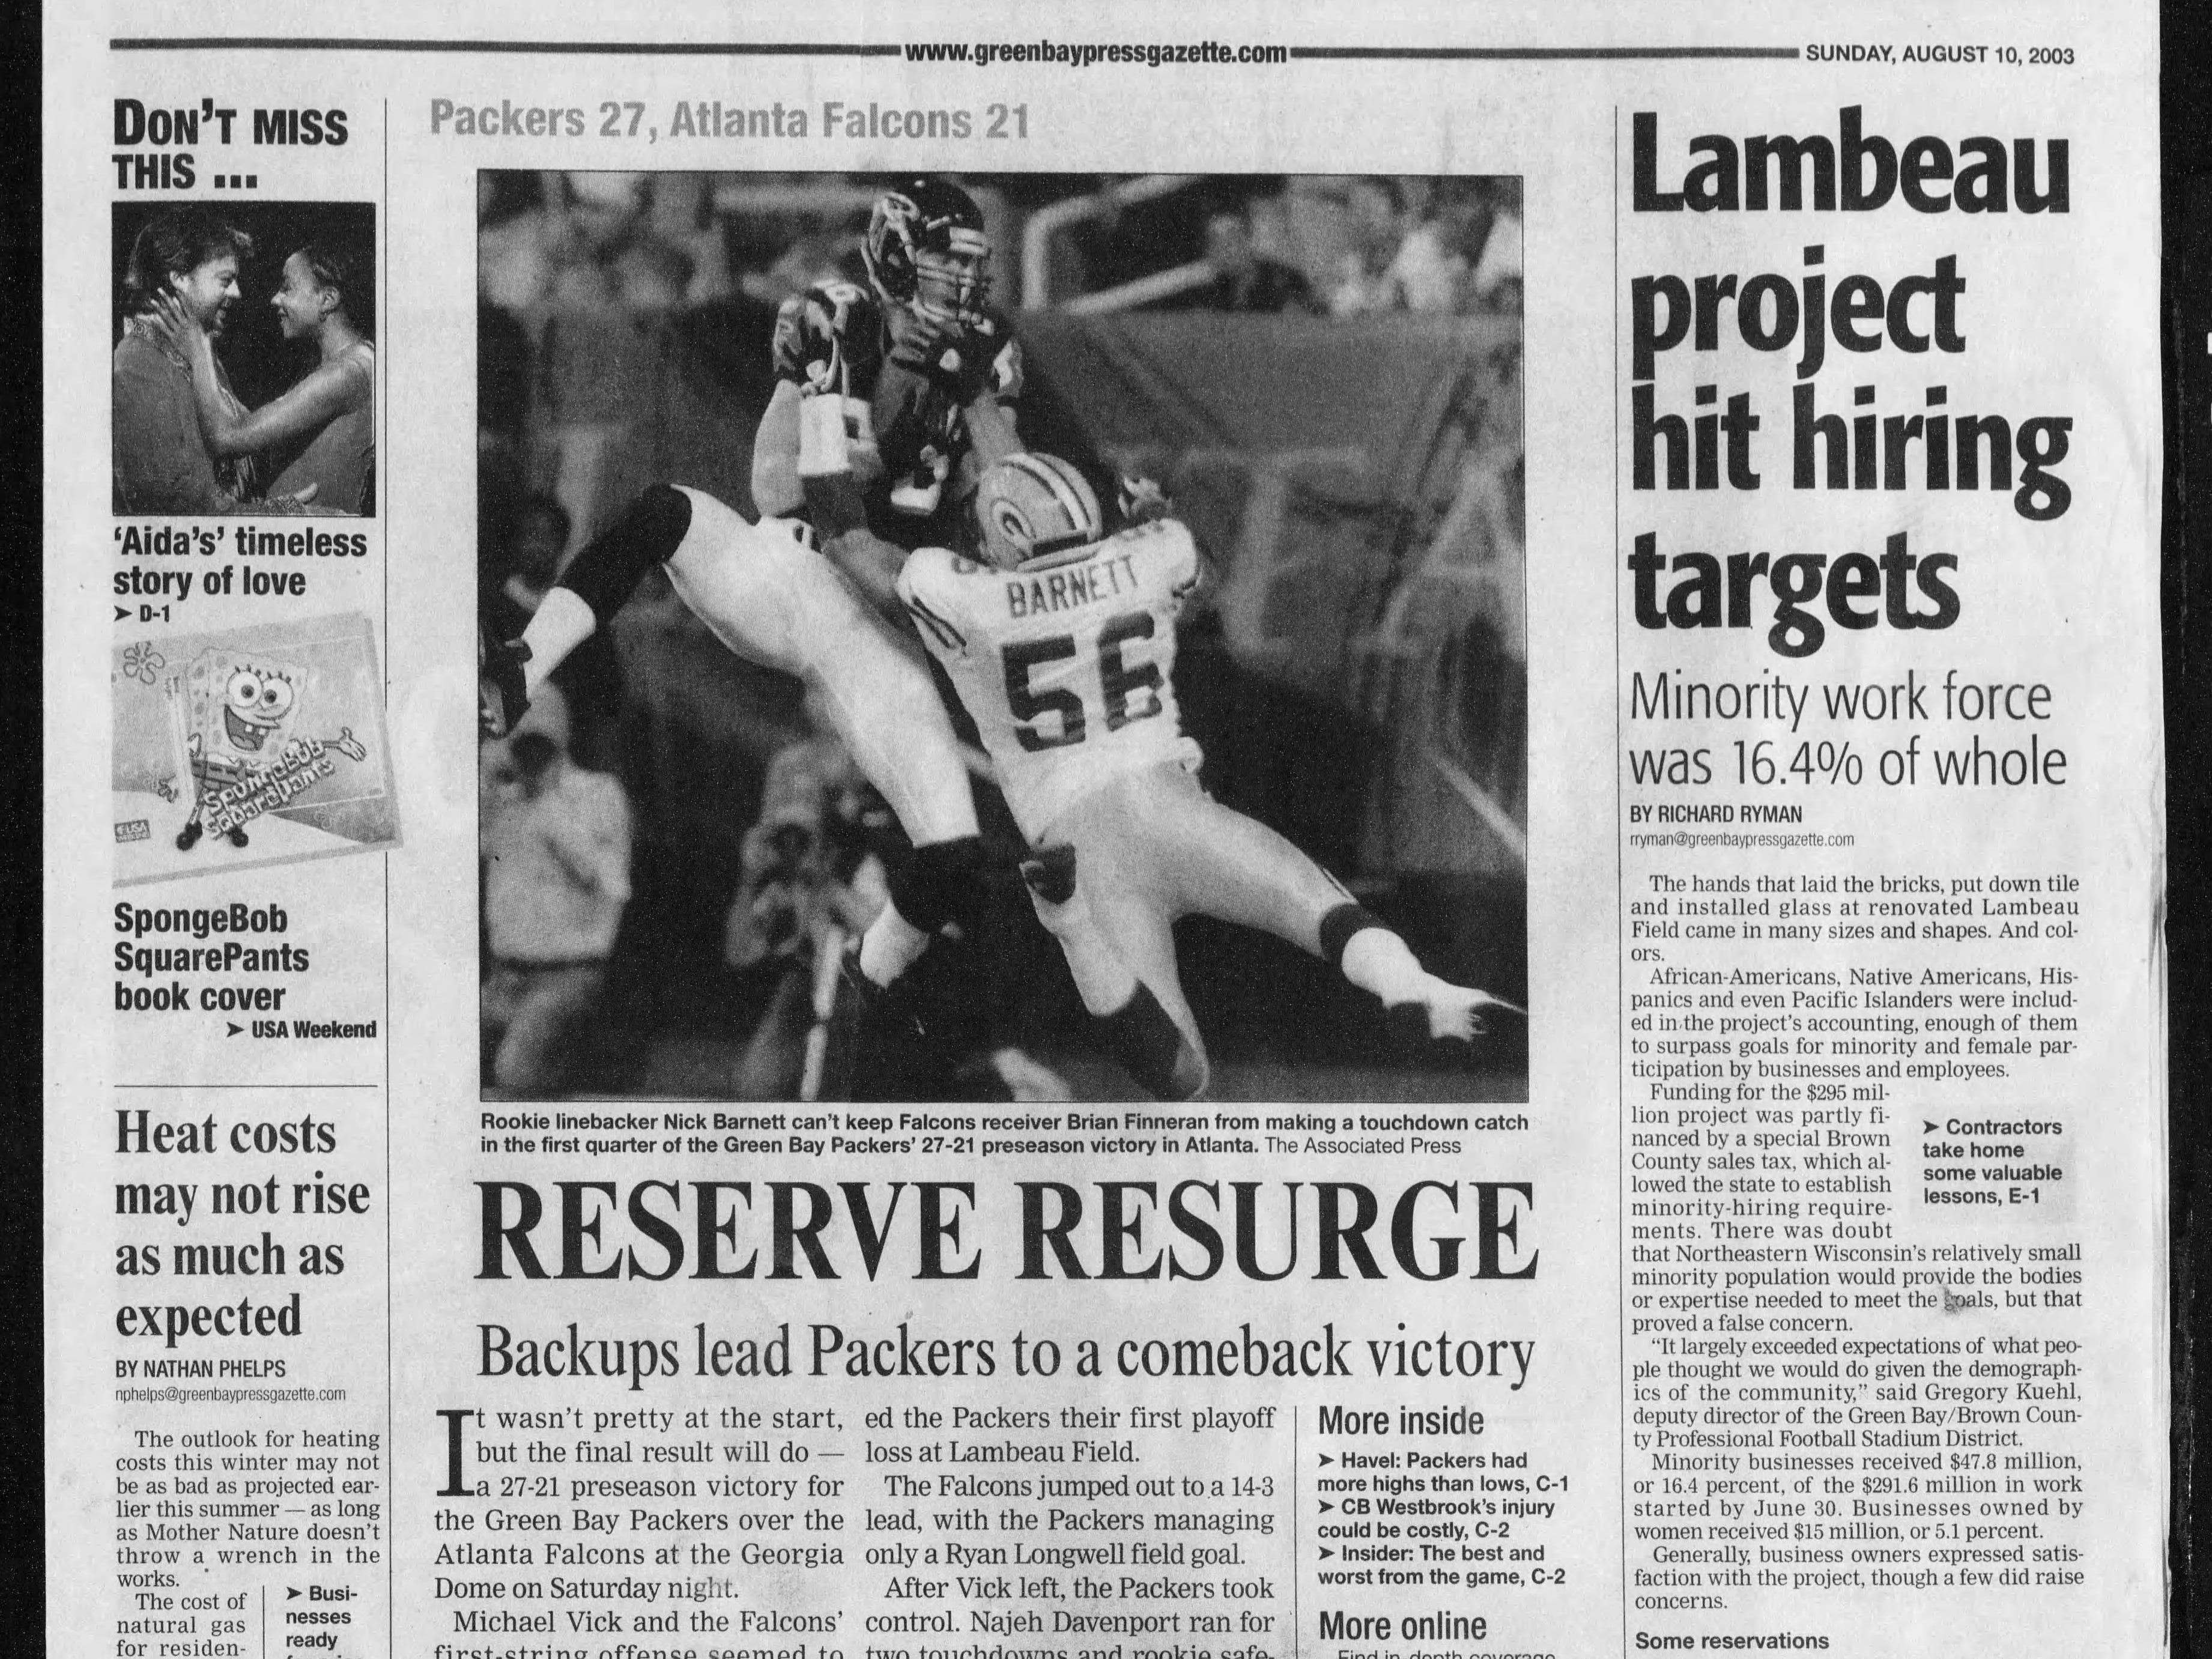 Aug. 10, 2003